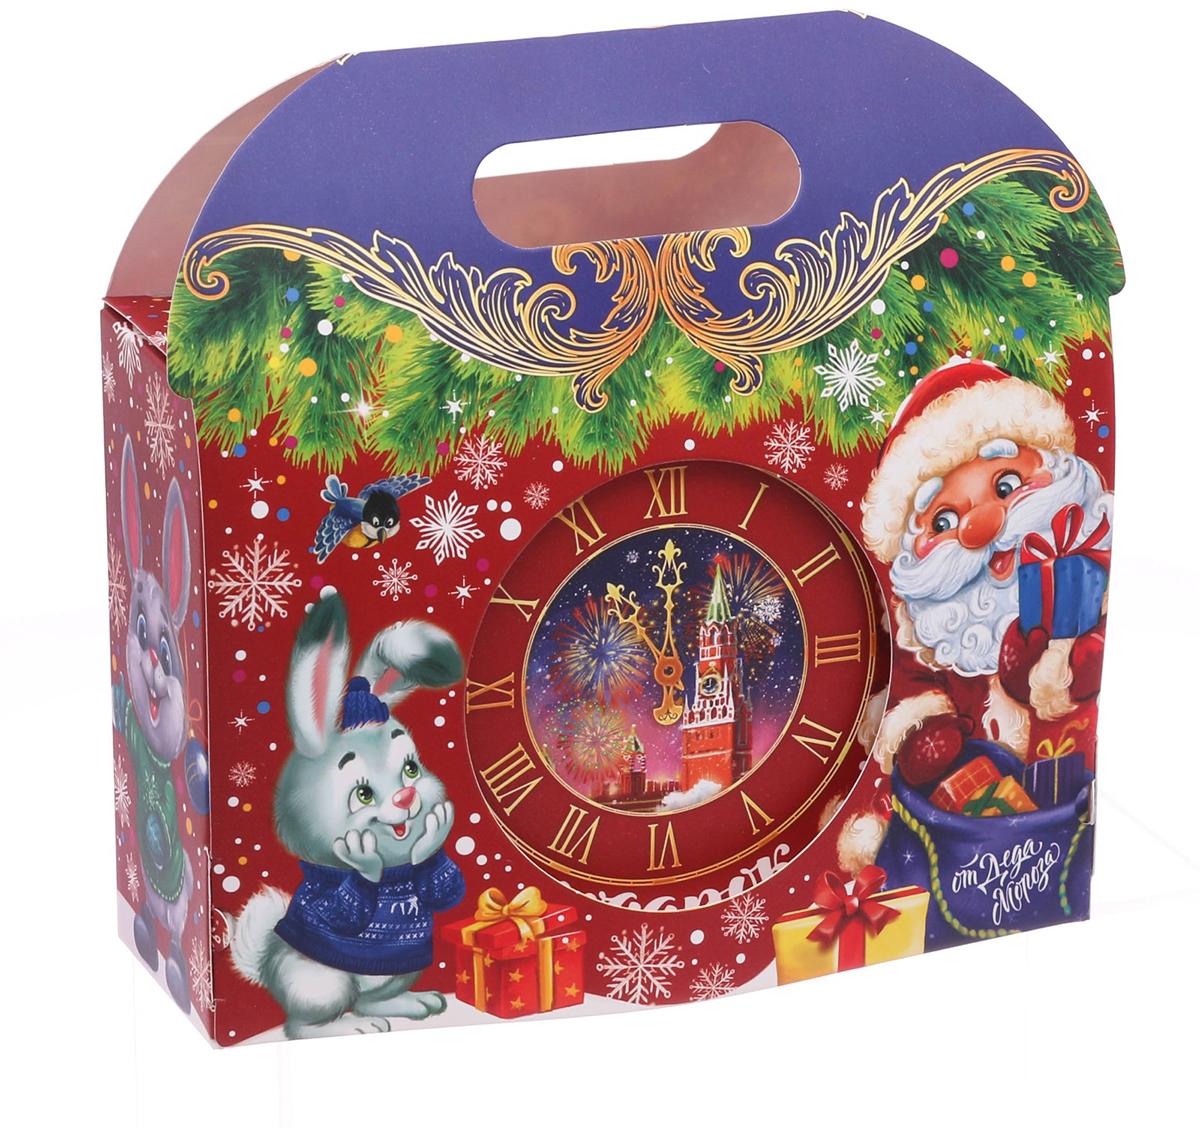 Коробка подарочная Дарите Счастье Новогодний подарок, складная, 18,5 х 13 х 6 см декоративный магнит новогодний подарок 6 см х 5 см 31544